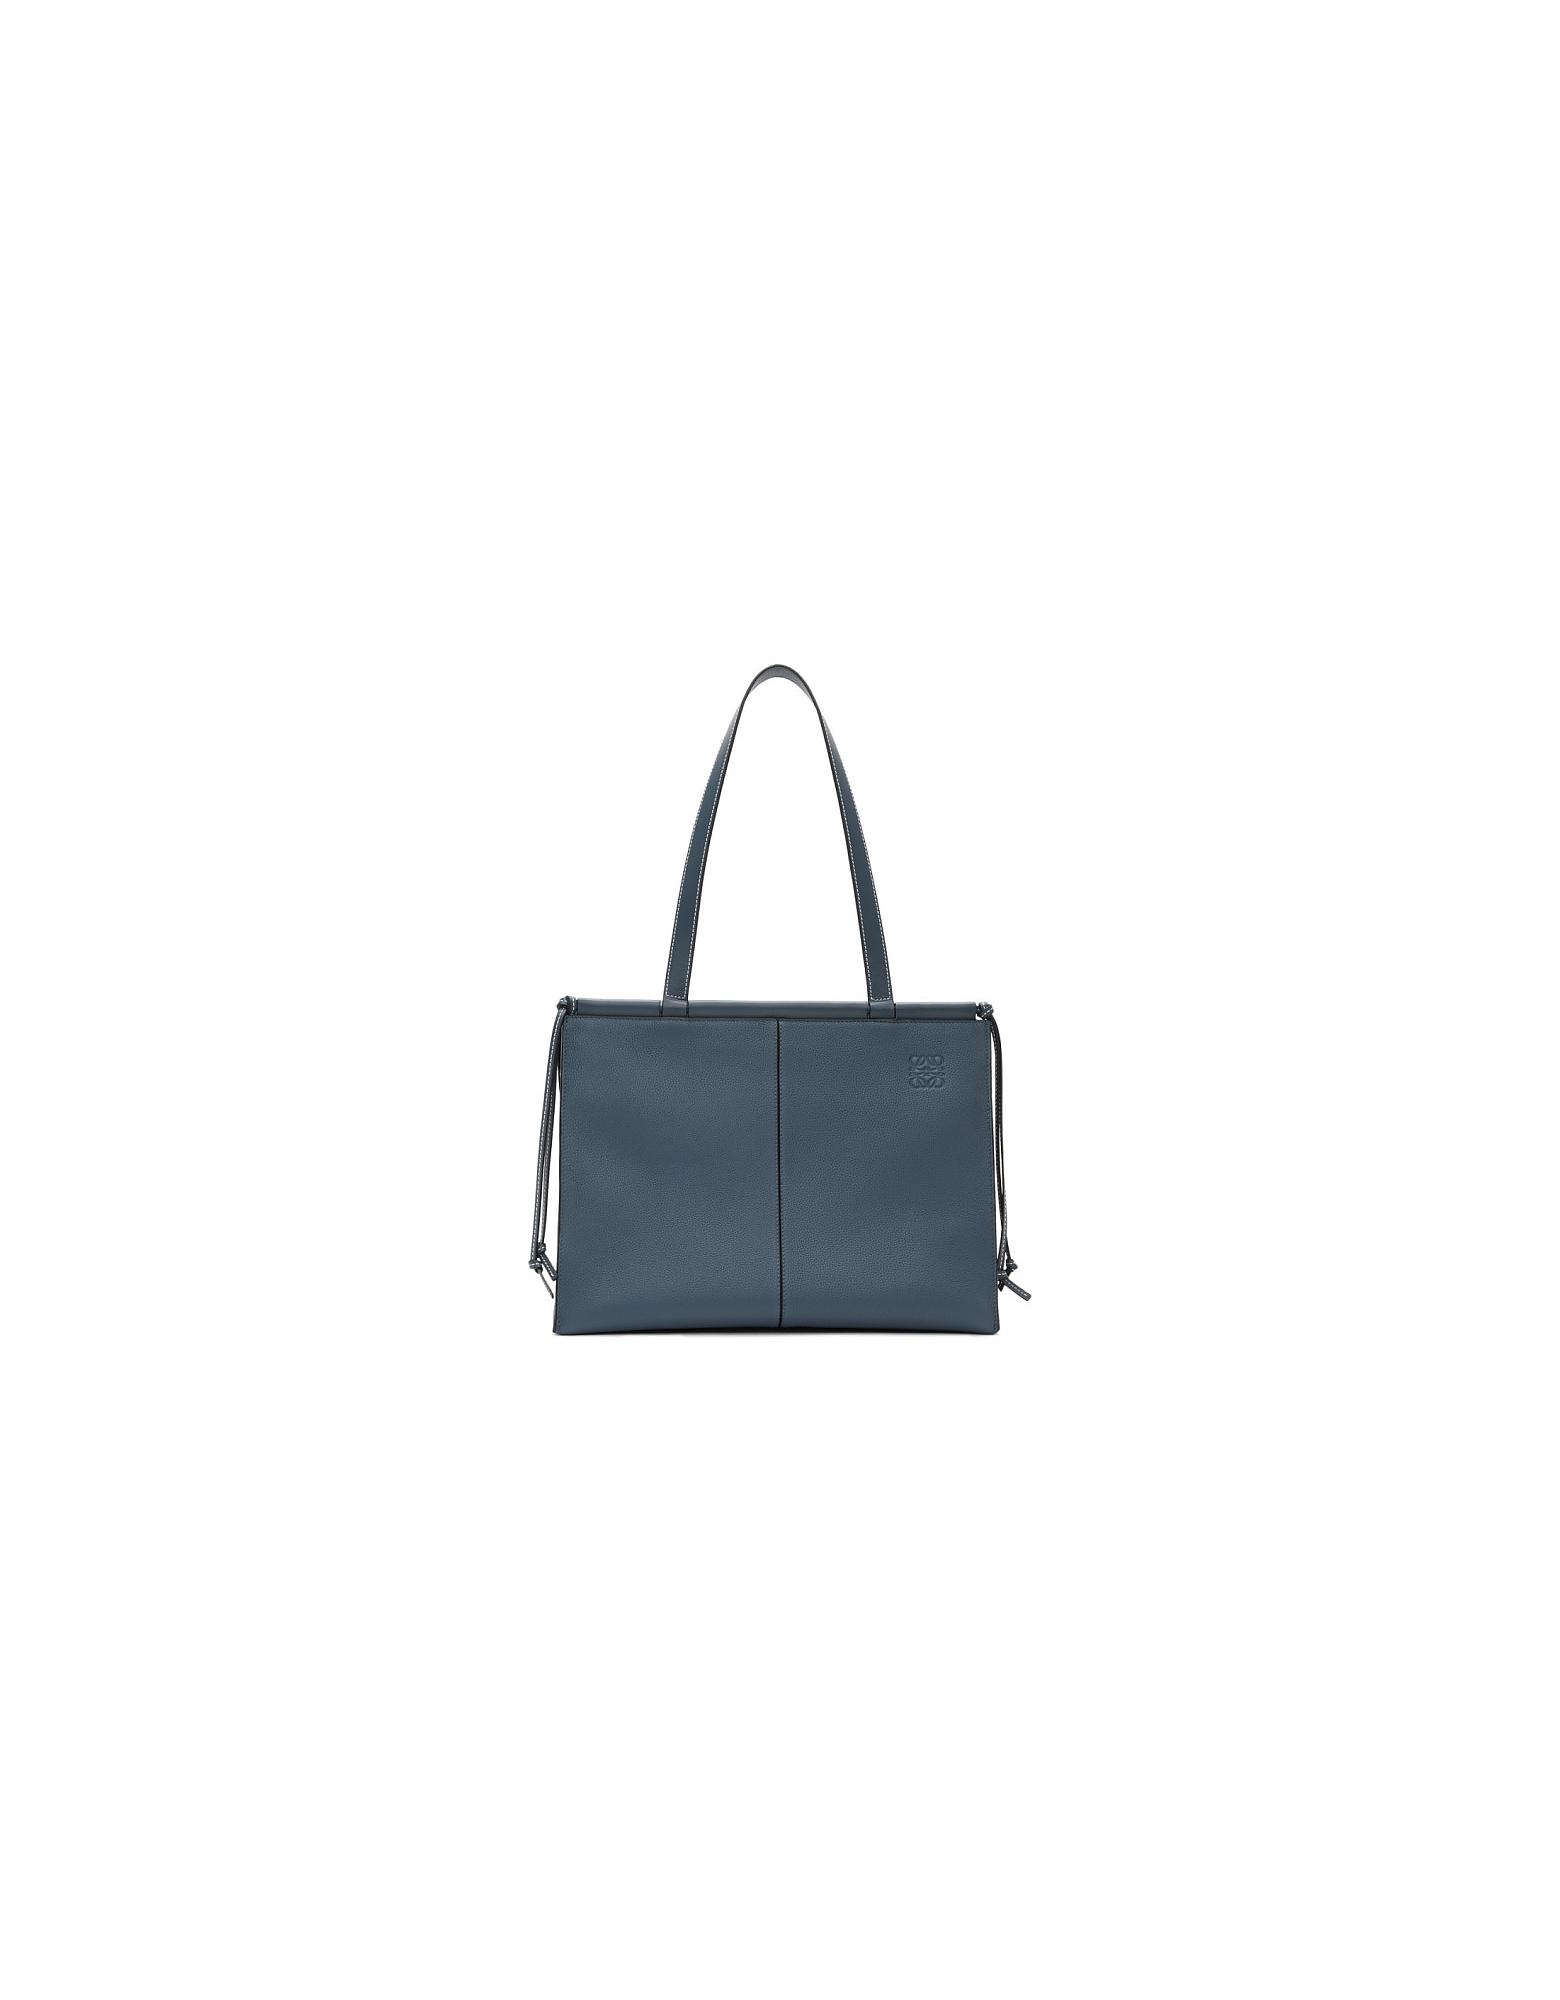 Loewe Designer Handbags, Blue Cushion Tote